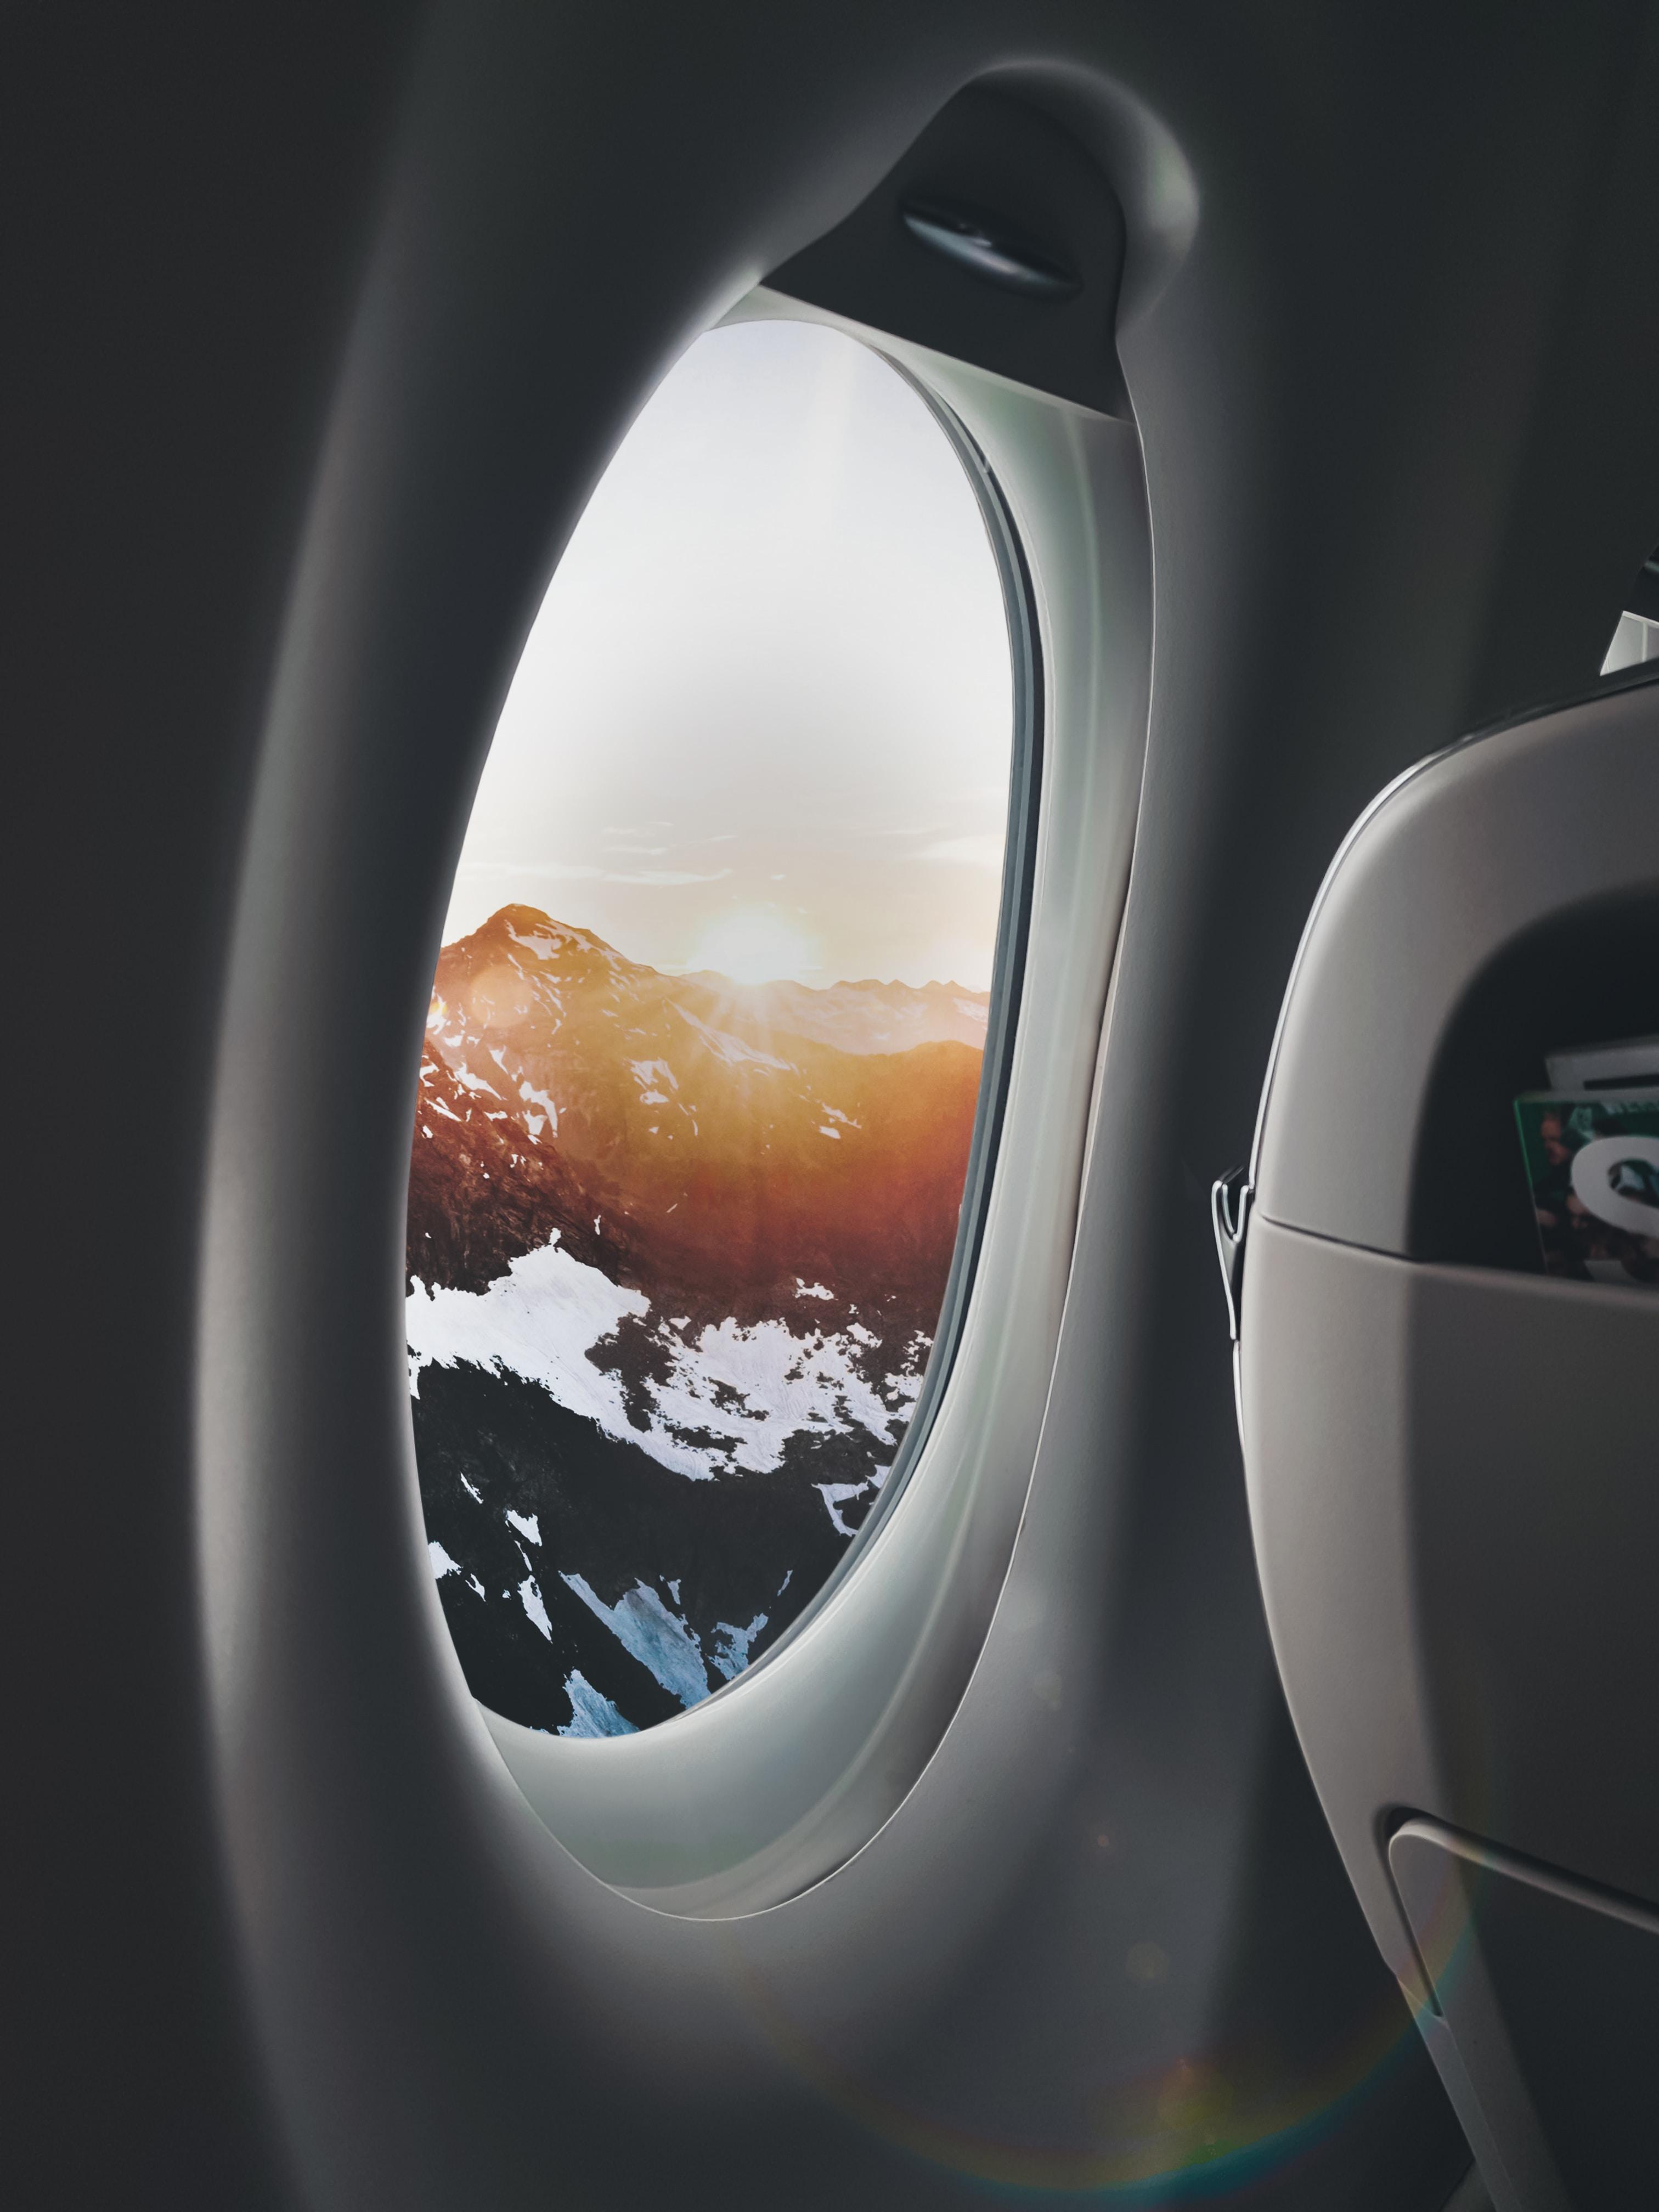 plane window showing mountain